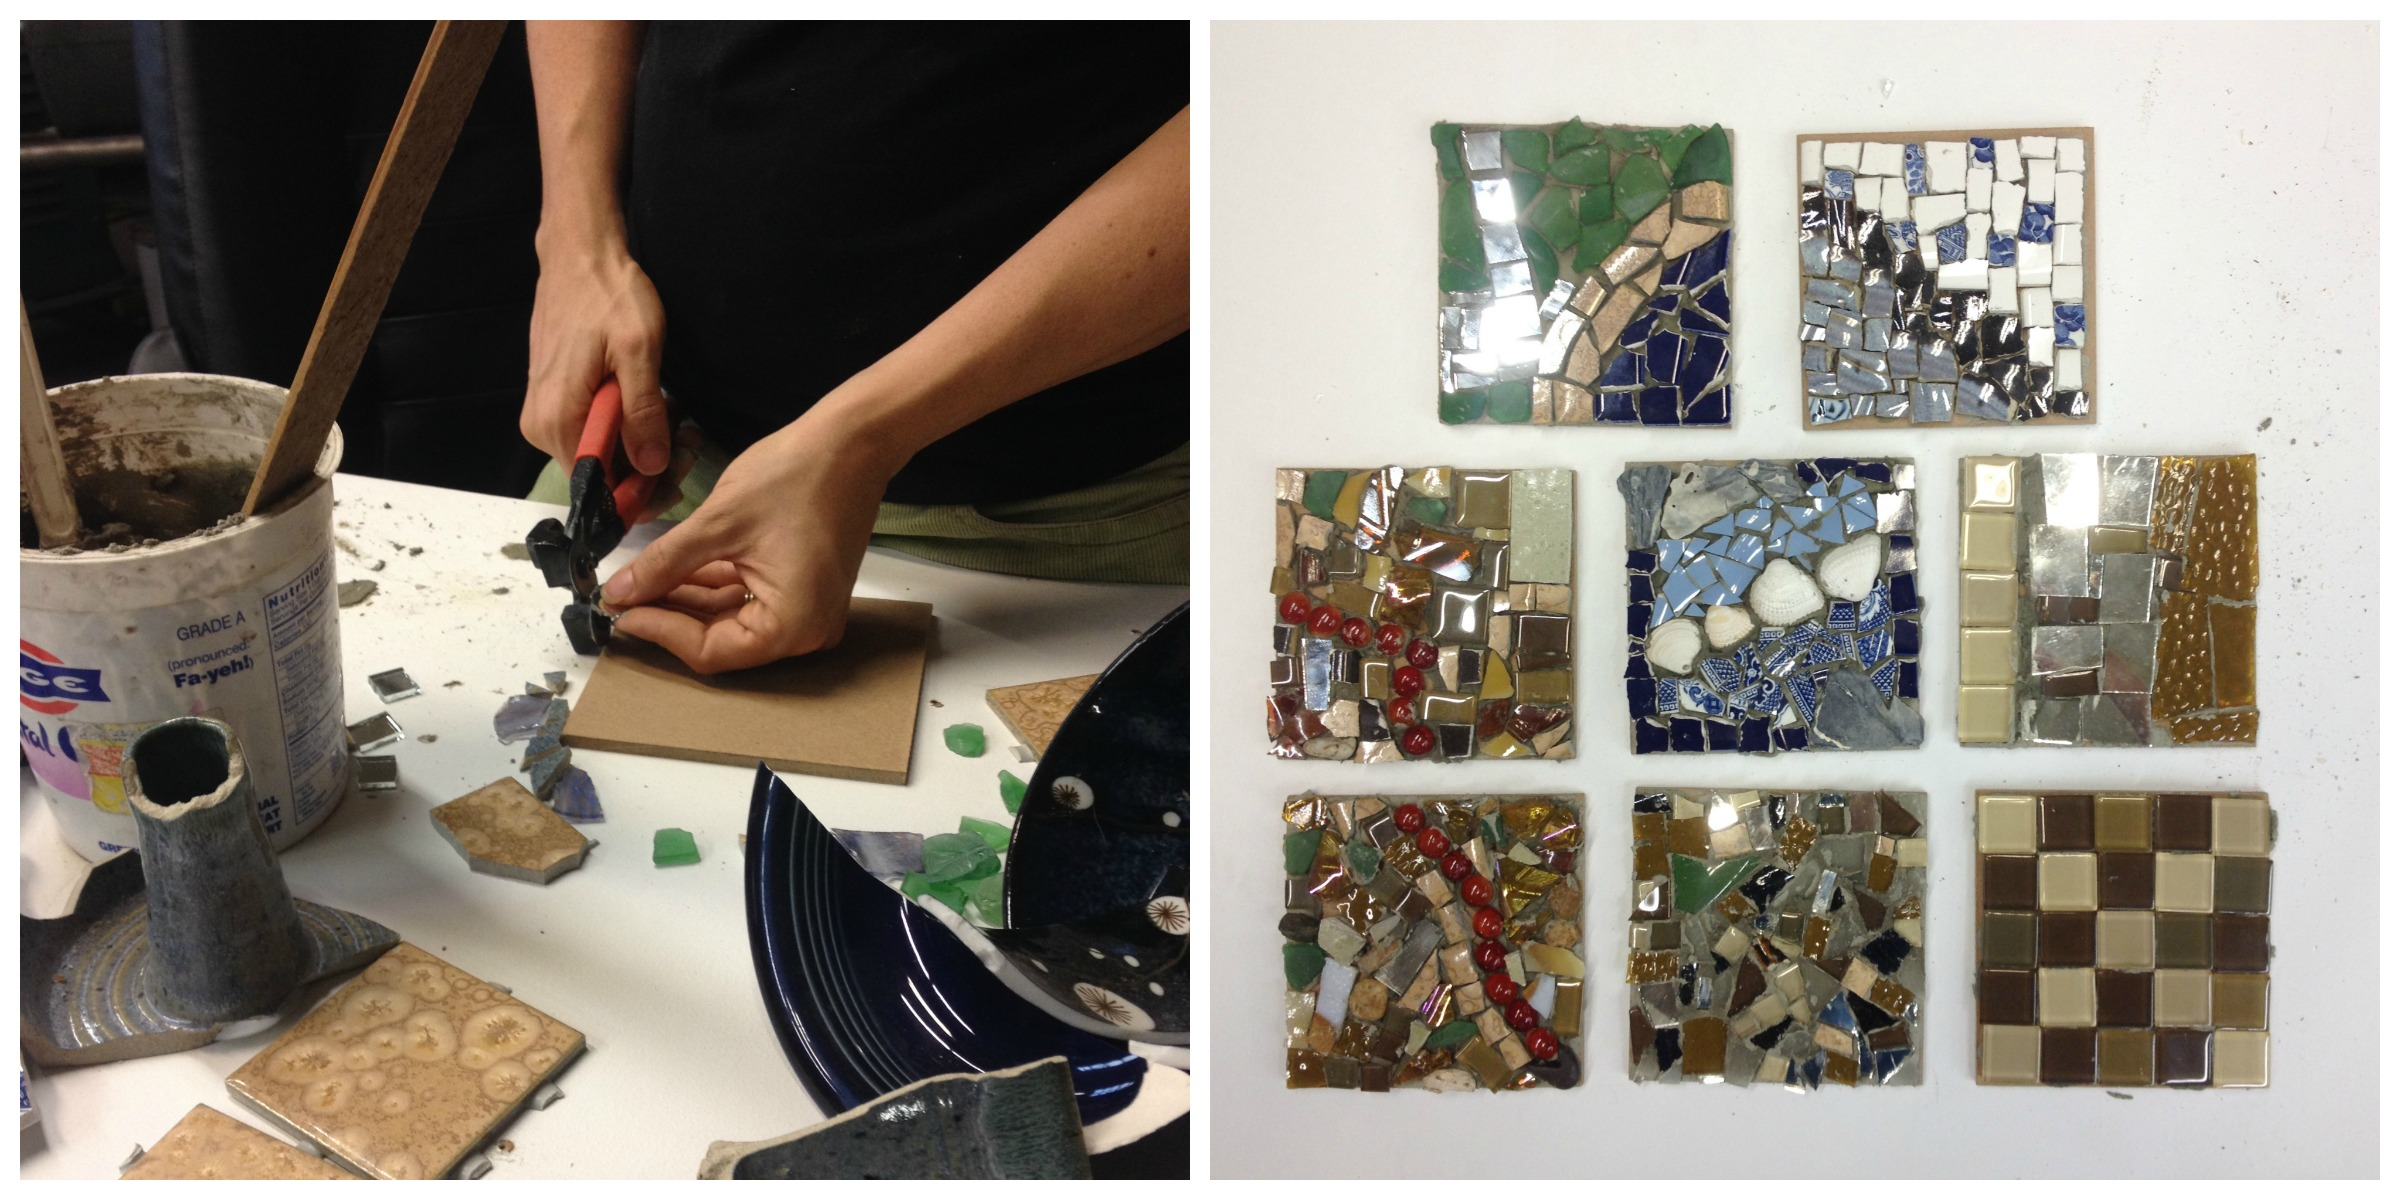 Mosaic-classes-with-Johannah-PH2014.jpg